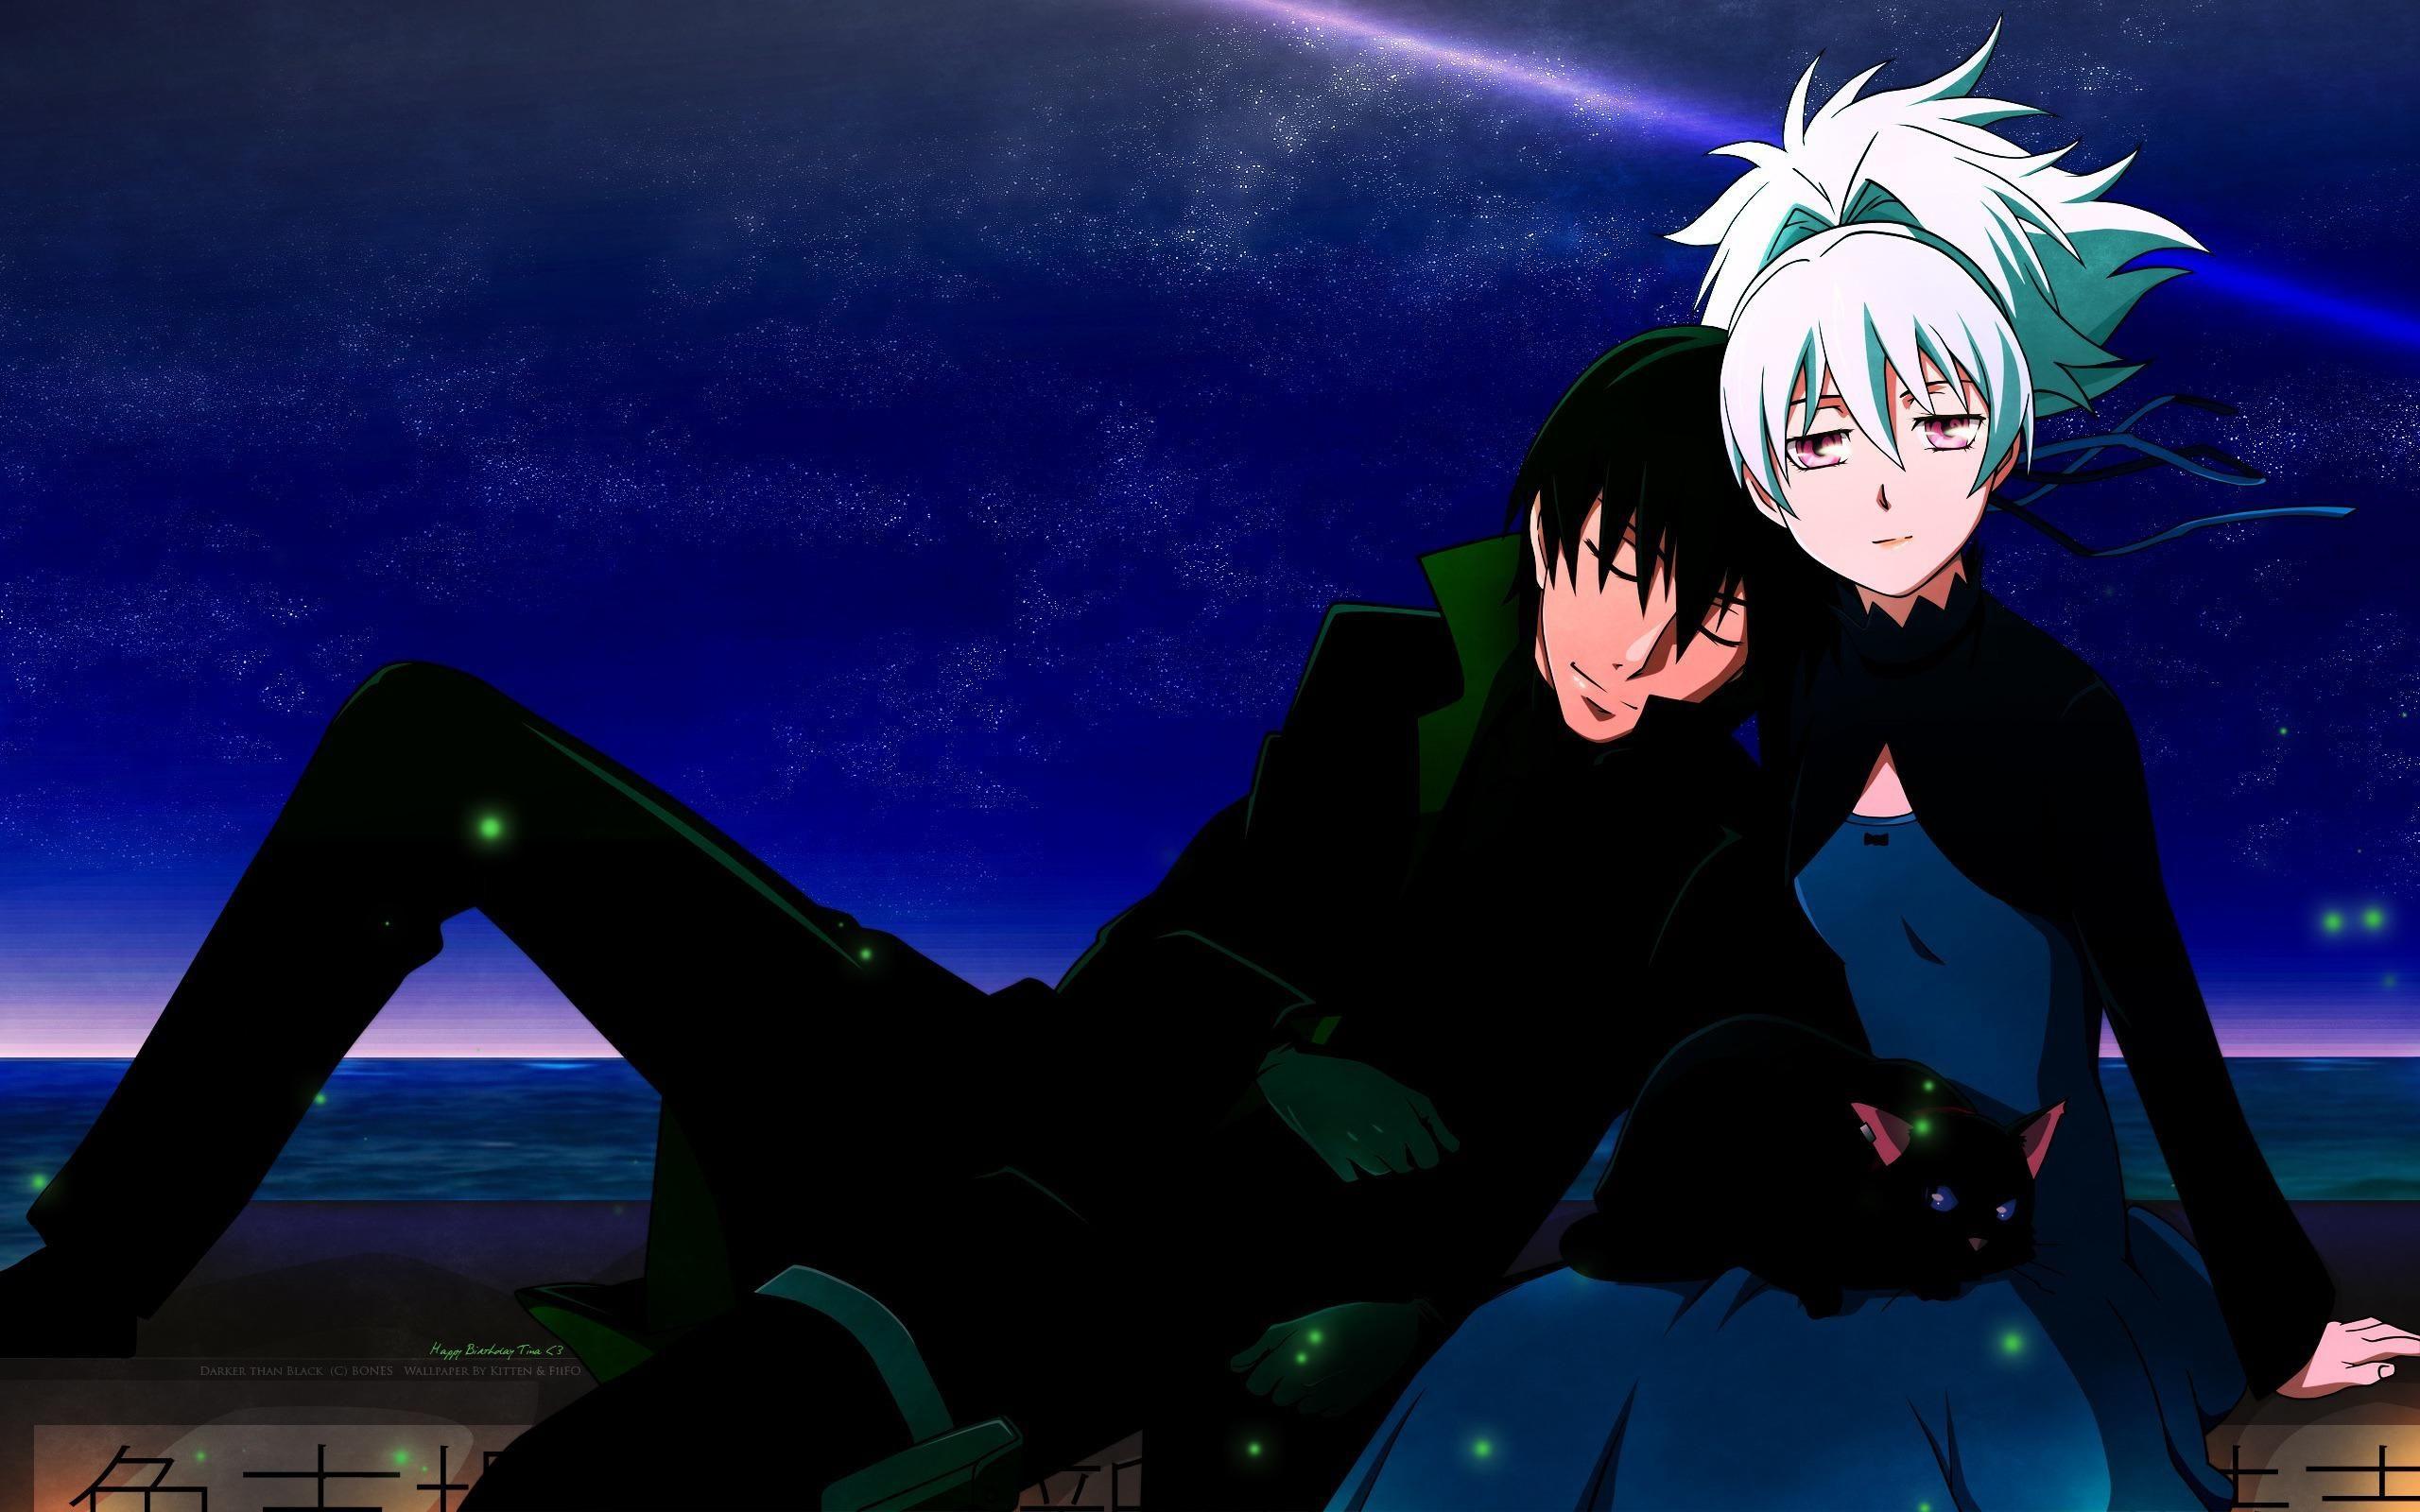 Anime Darker Than Black ダーカー, 黒, 黒の契約者